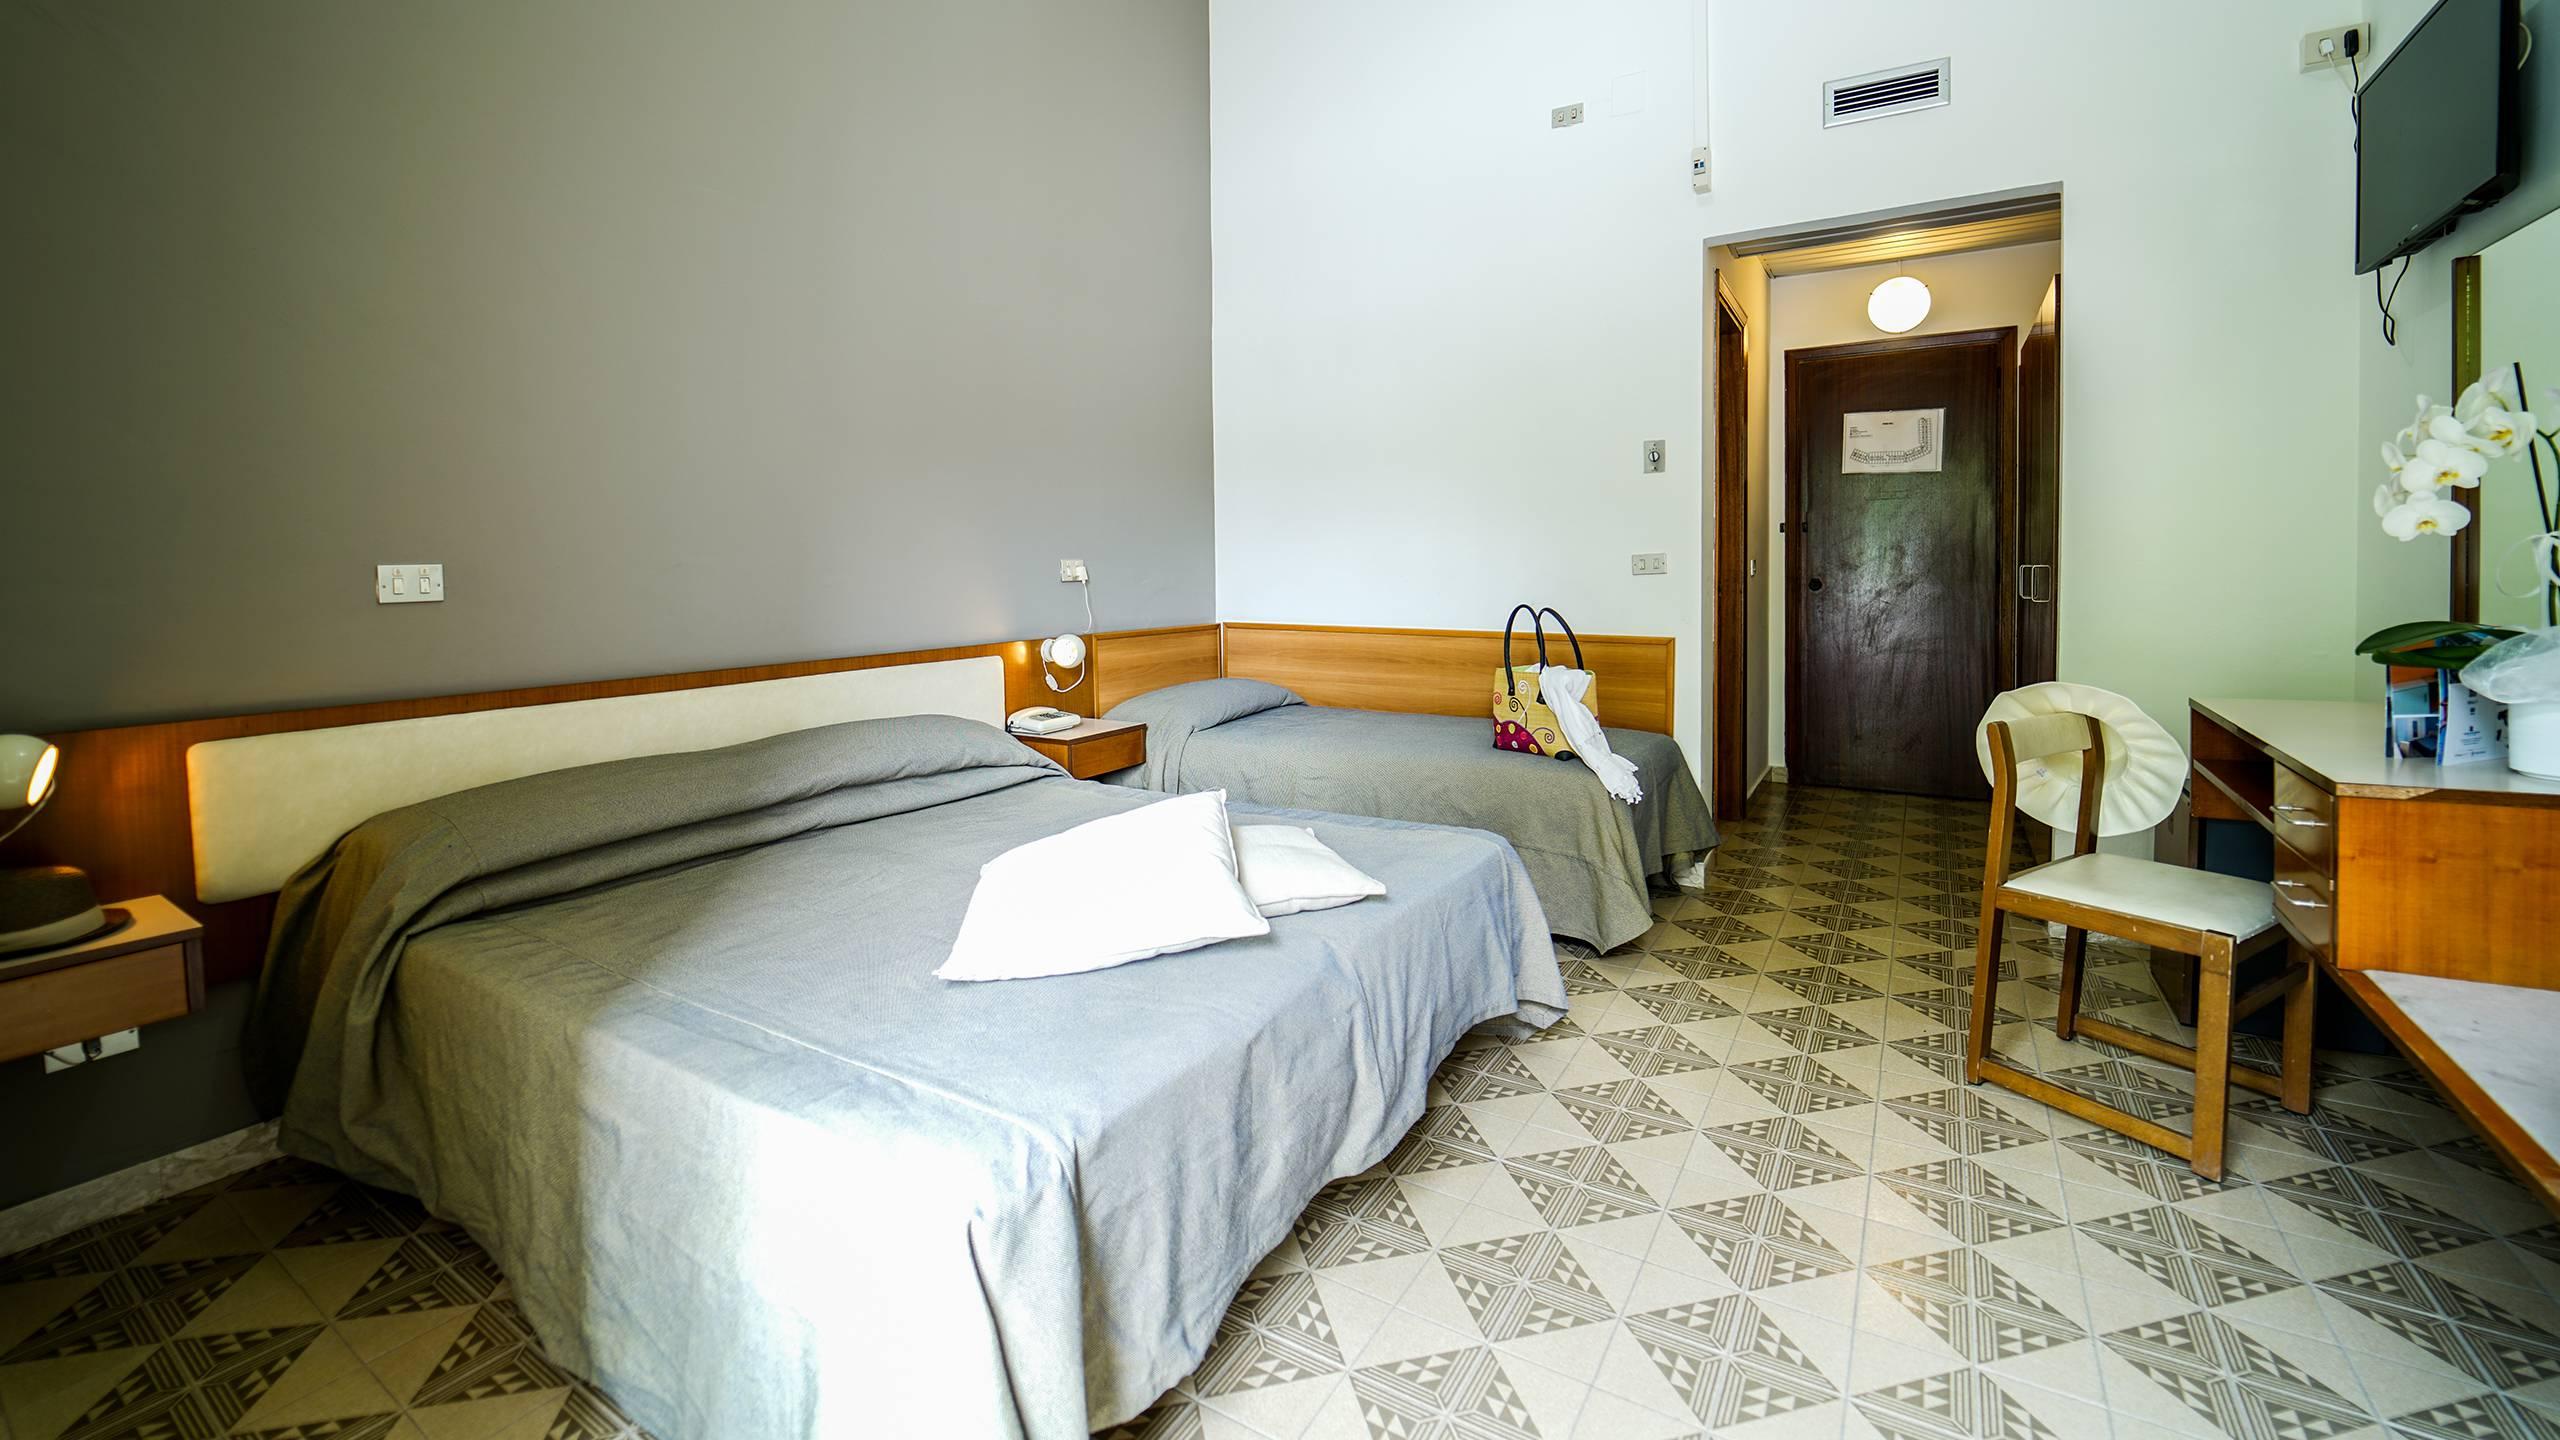 Santa-Caterina-Village-Scalea-basic-room-double-bed-single-bed-DSC00413